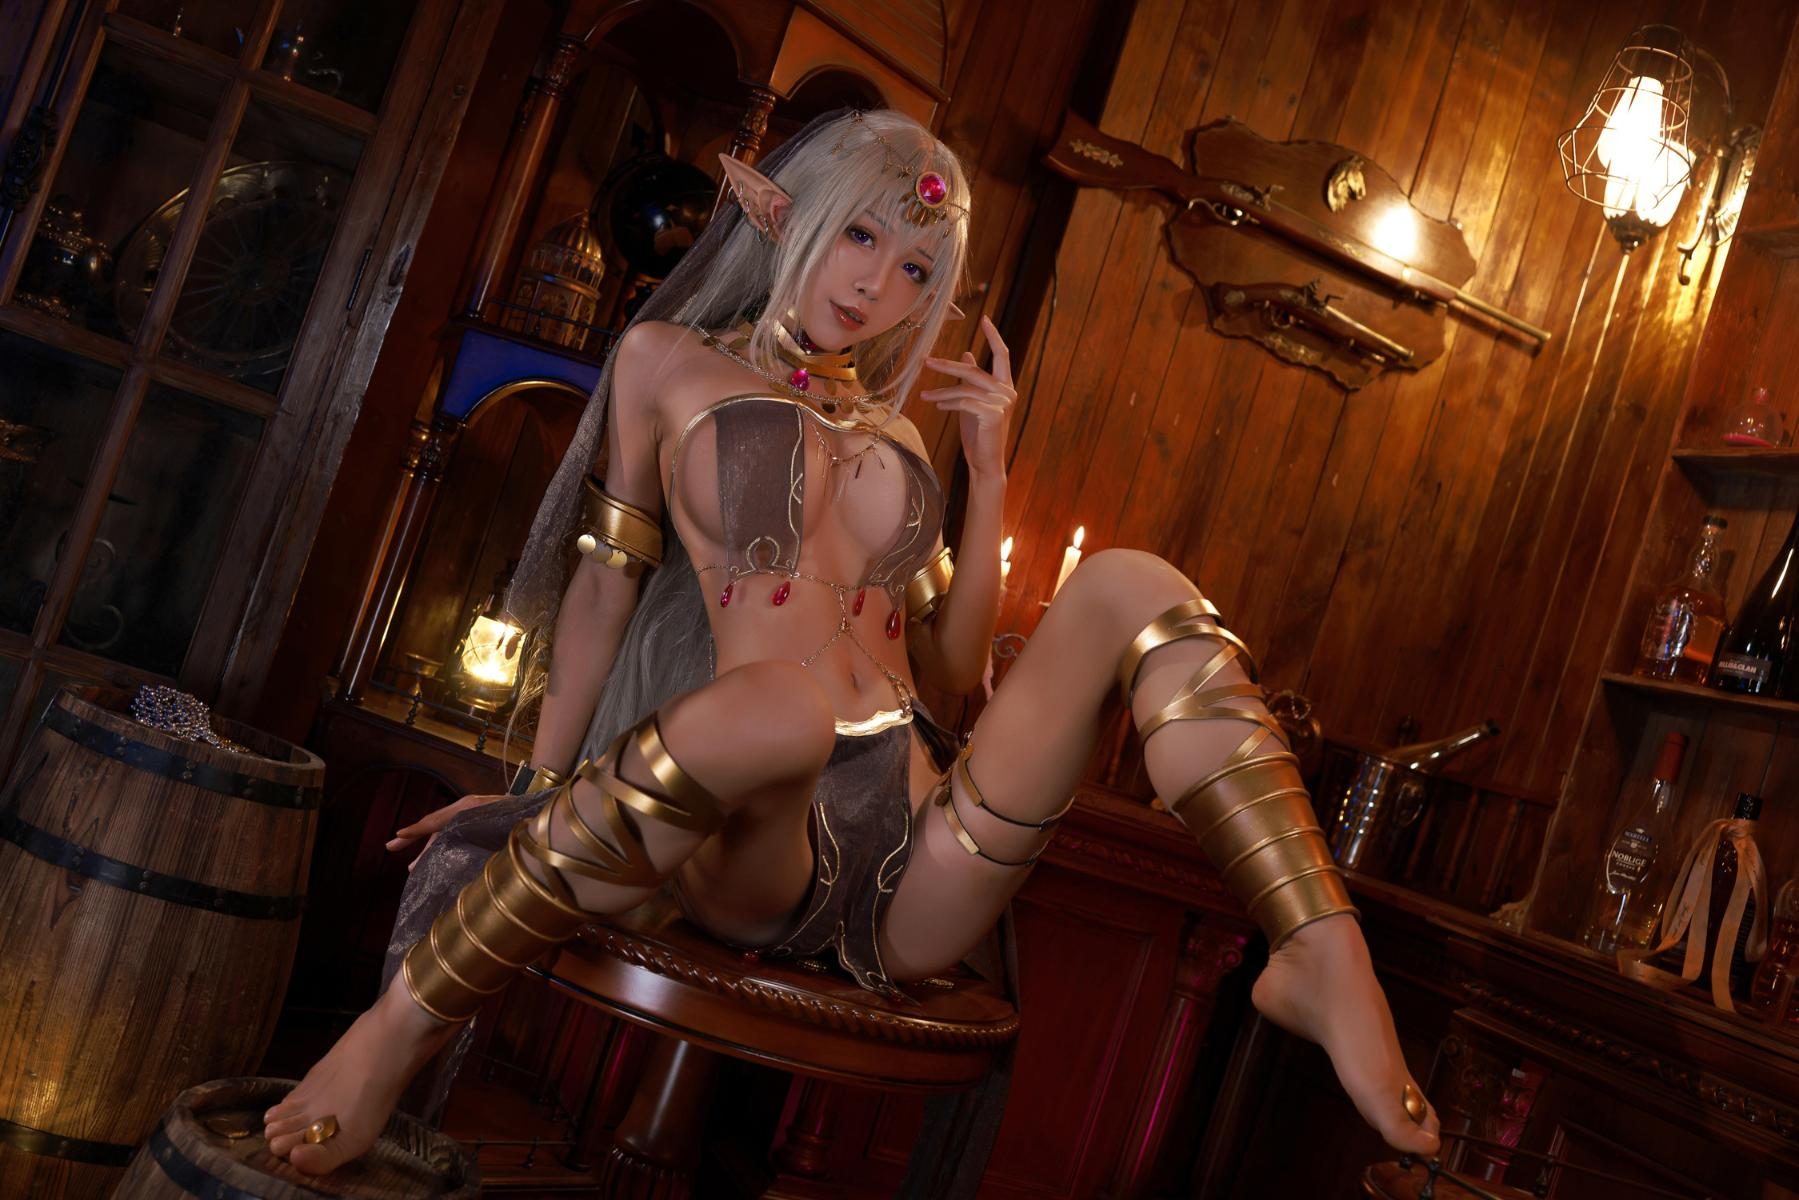 Tan Dancer Elf Succubus Cosplay by Aqua 12